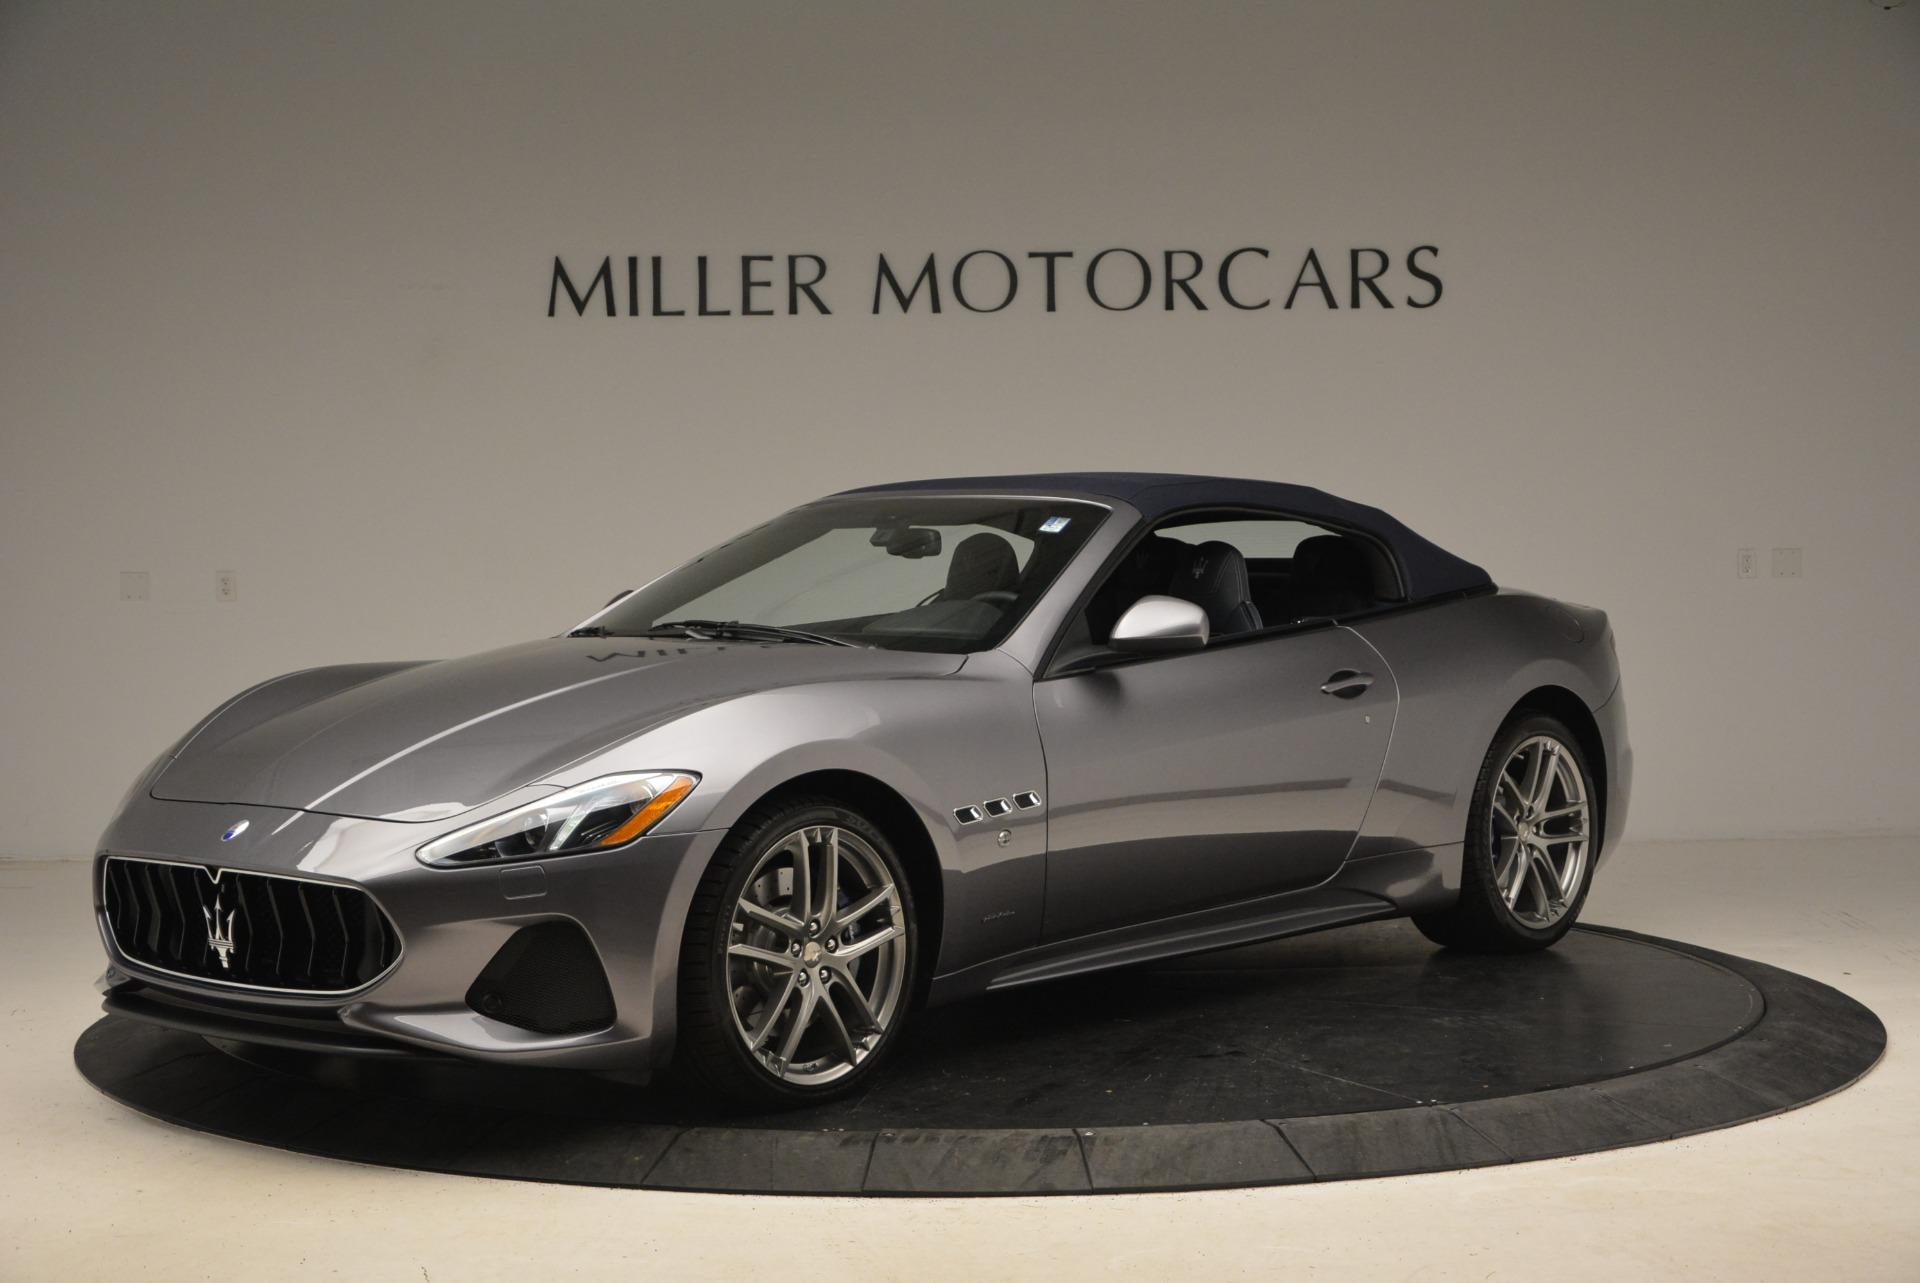 New 2018 Maserati GranTurismo Sport Convertible For Sale In Westport, CT 2272_p2